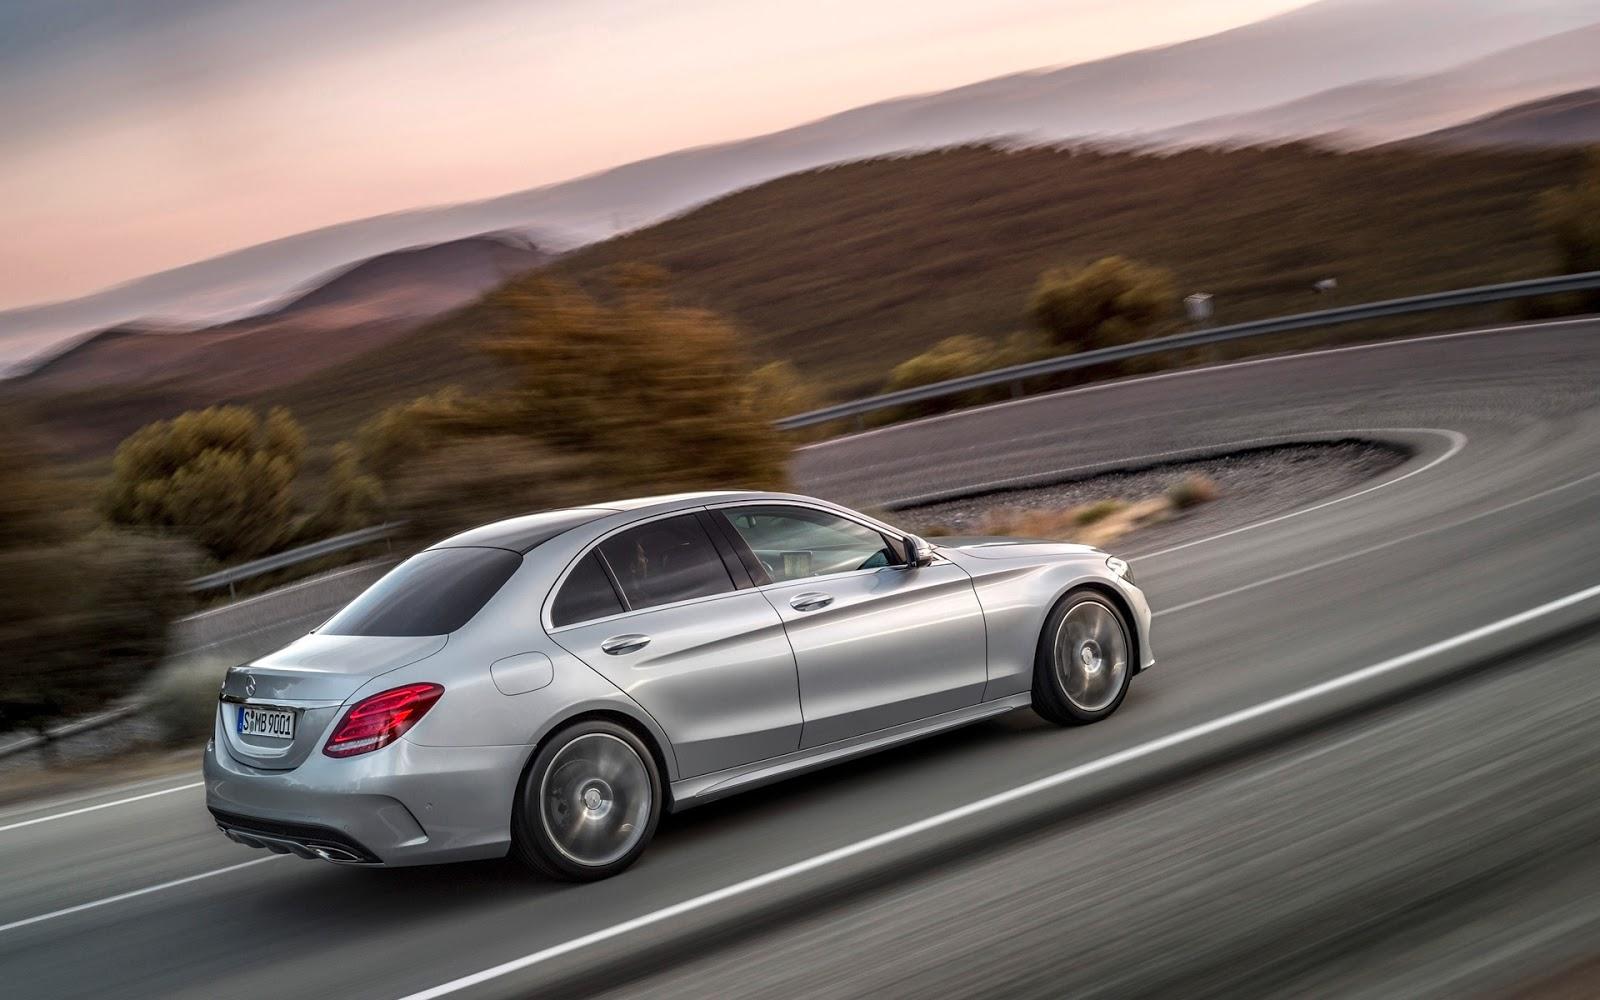 2014-Mercedes-Benz-C-Class-C250-AMG-Avantgarde-Best Sedan 2015